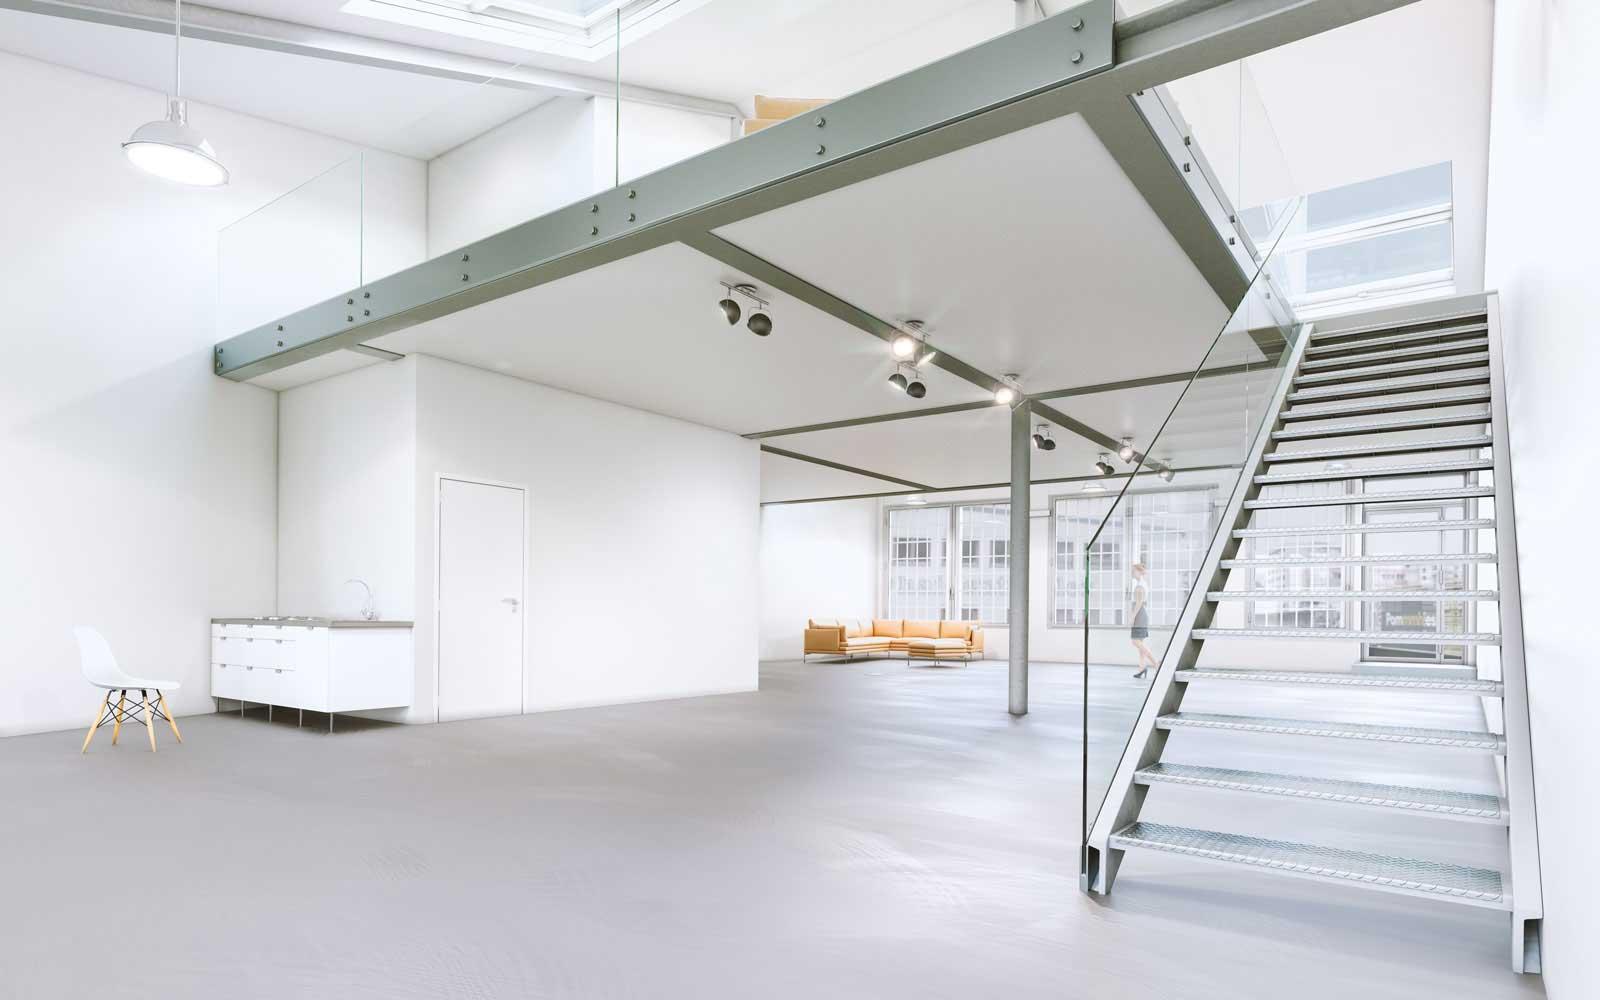 Salis Loft GmH: Fabrik BBK, Robinigstraße, Salzburg 3